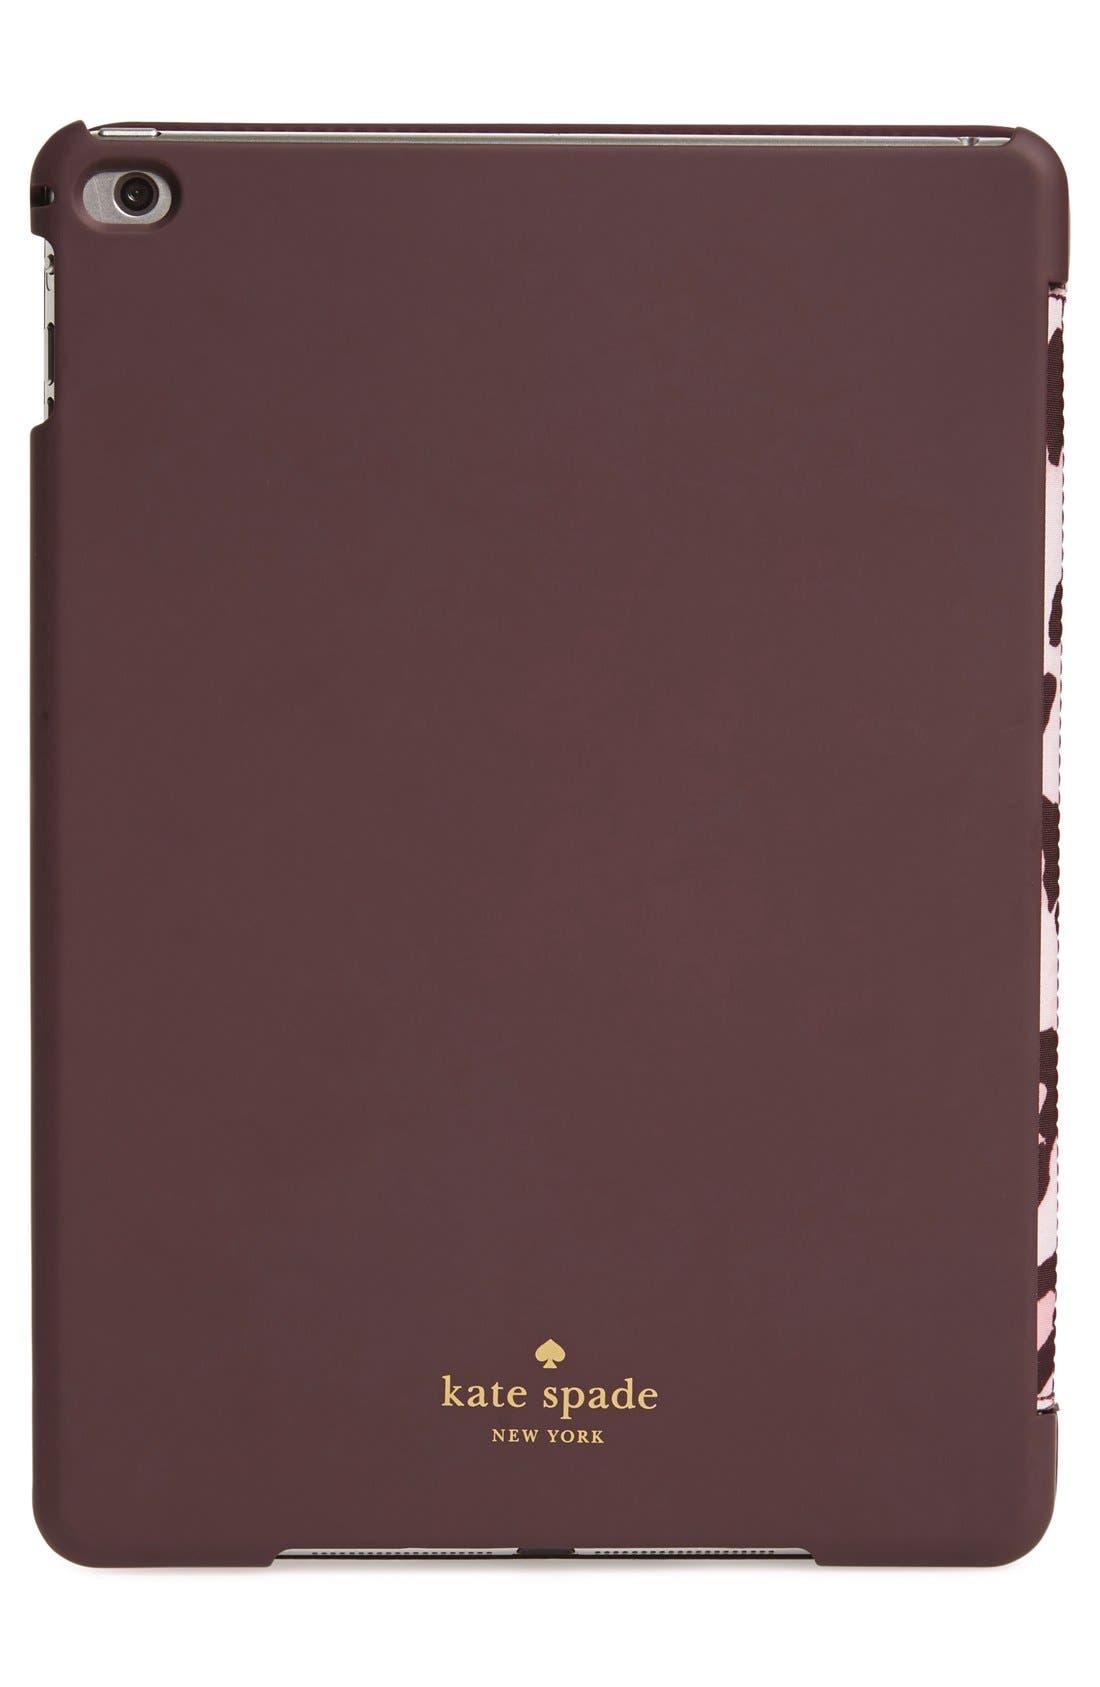 KATE SPADE NEW YORK,                             leopard print iPad Air 2 hardcase folio,                             Alternate thumbnail 4, color,                             650